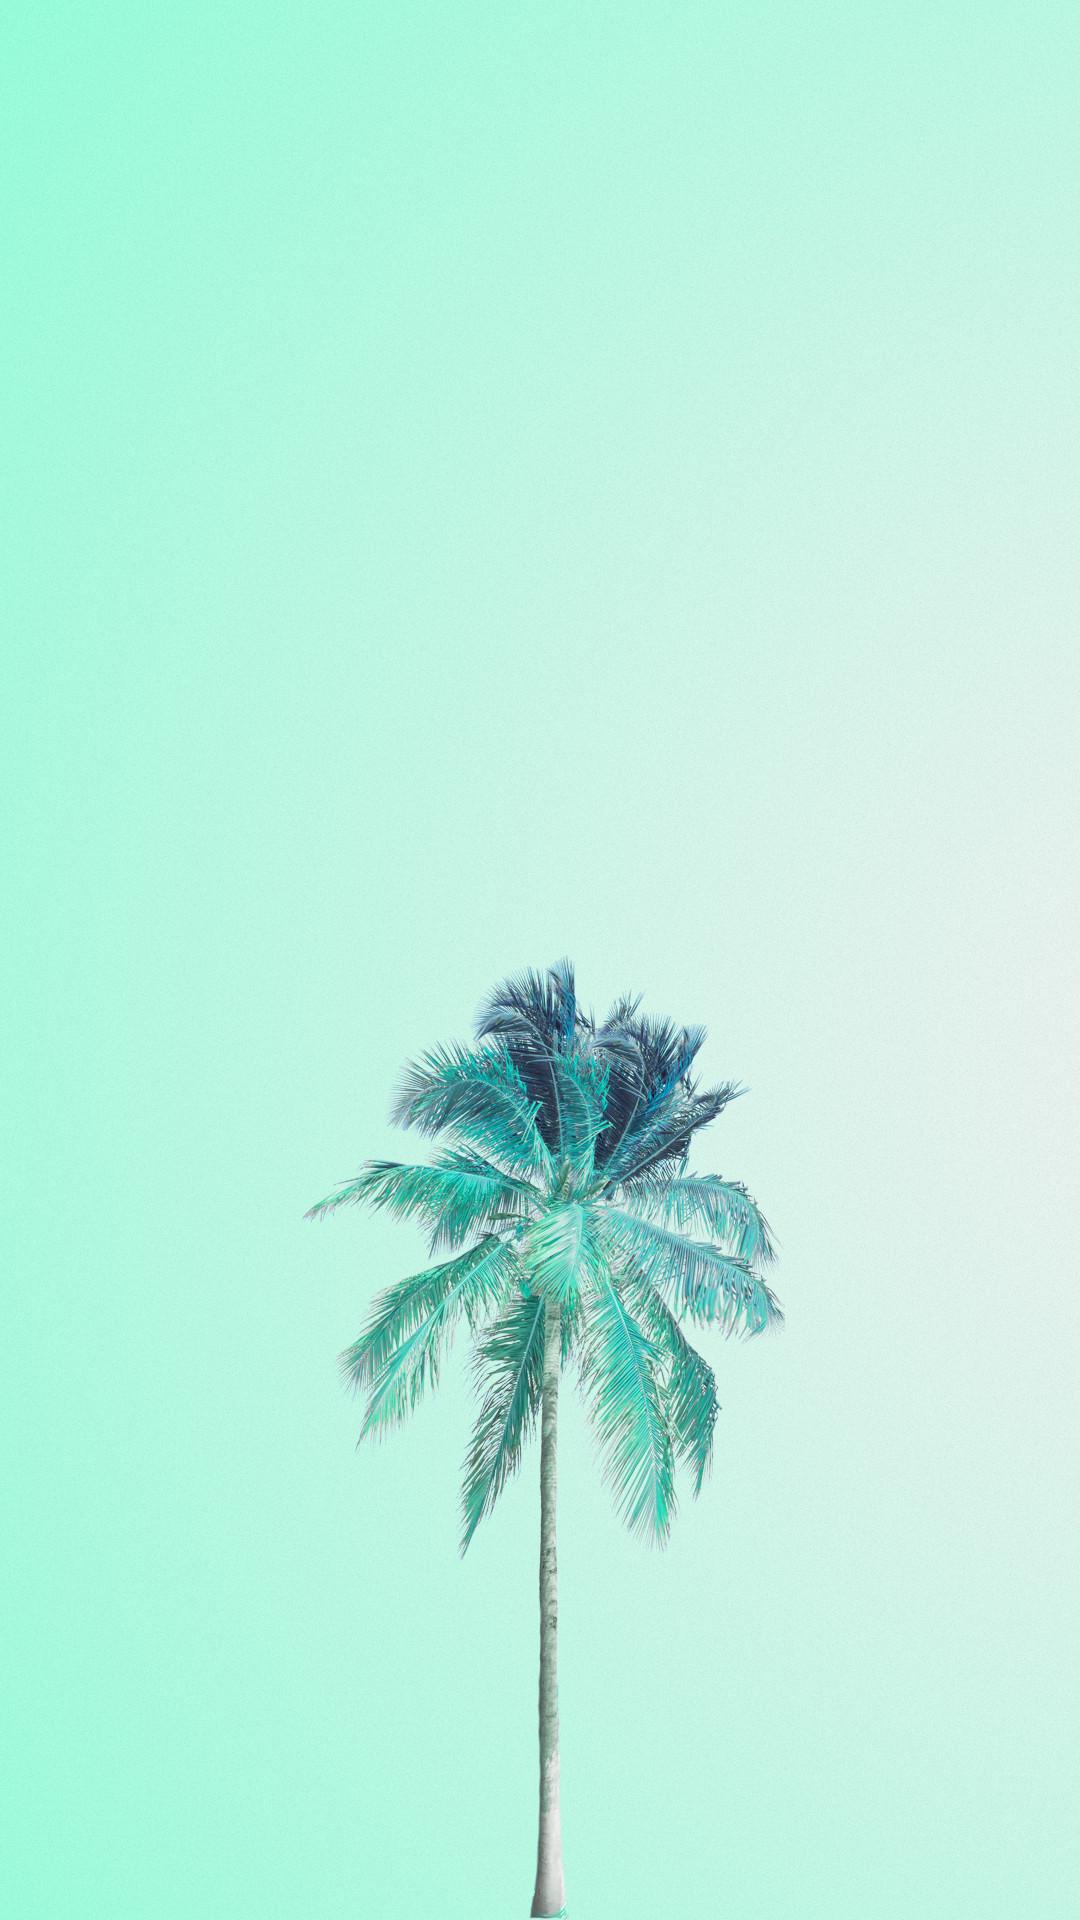 Mint green palm tree iphone wallpaper phone background lock screen